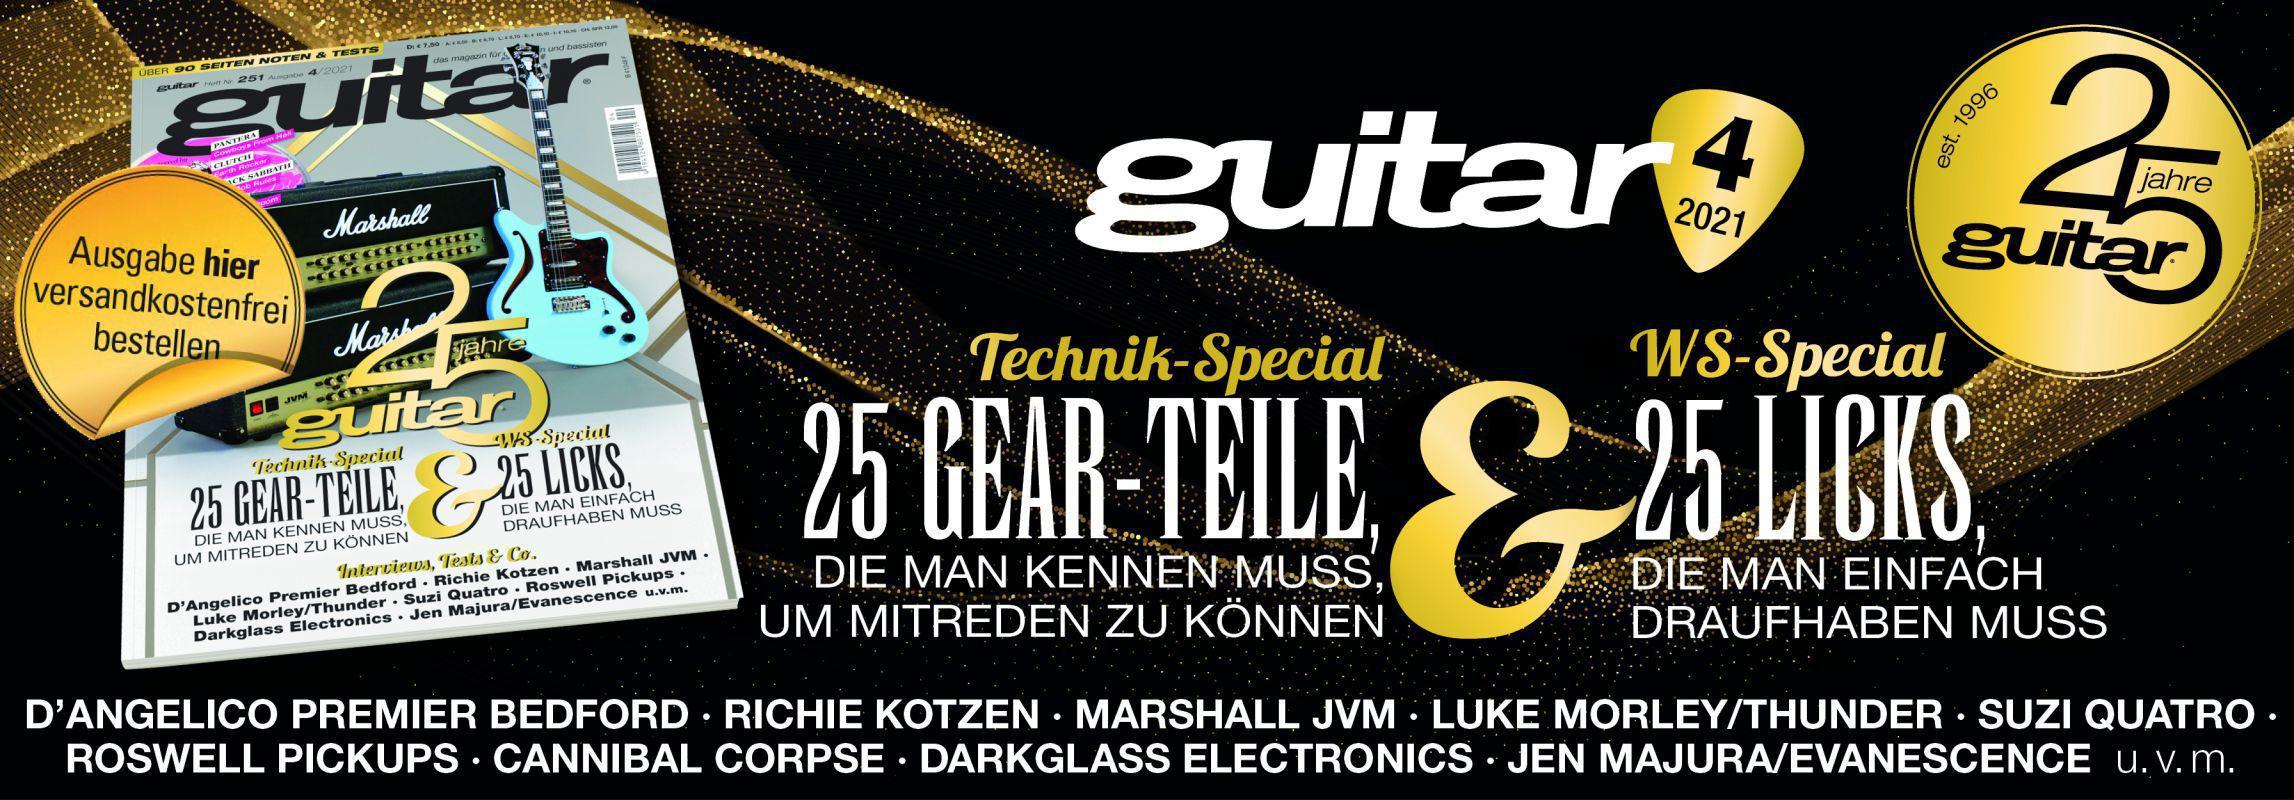 guitar Magazin Ausgabe 4/2021